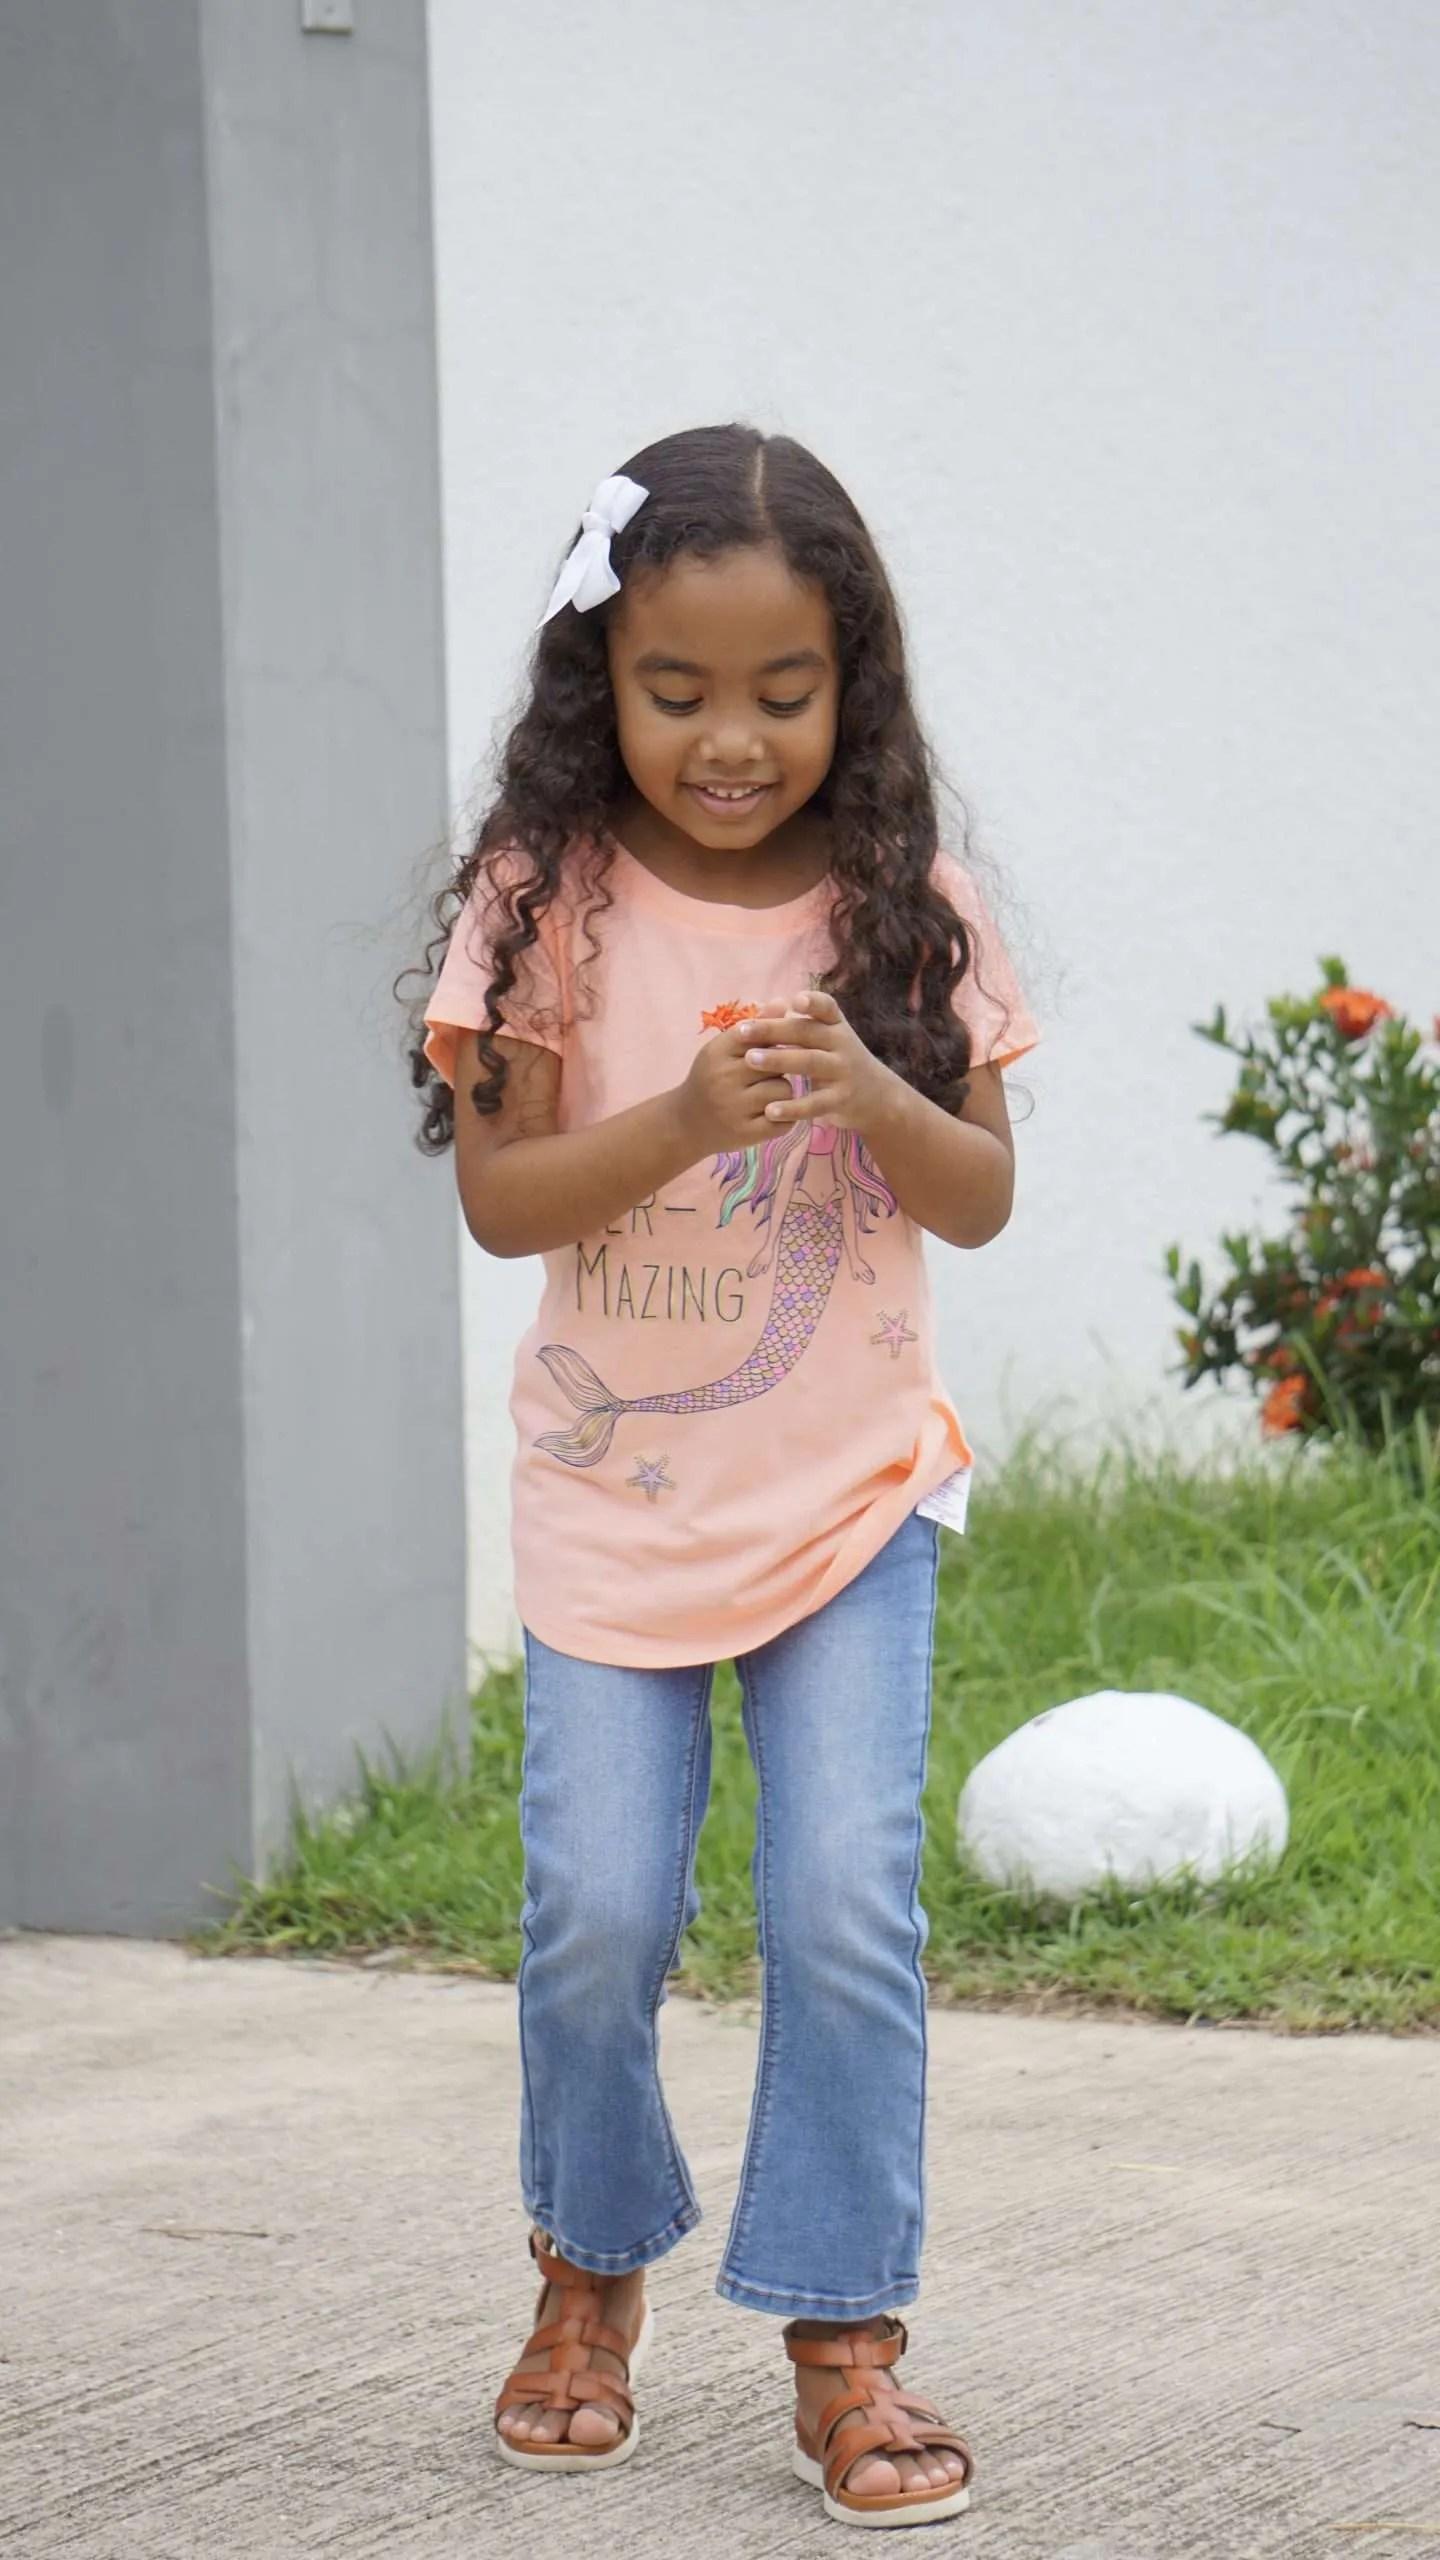 Walmart Fashion, Back to School Fashion, Fashion, Kids Fashion, Children Fashion, Children Style, Kids Style,